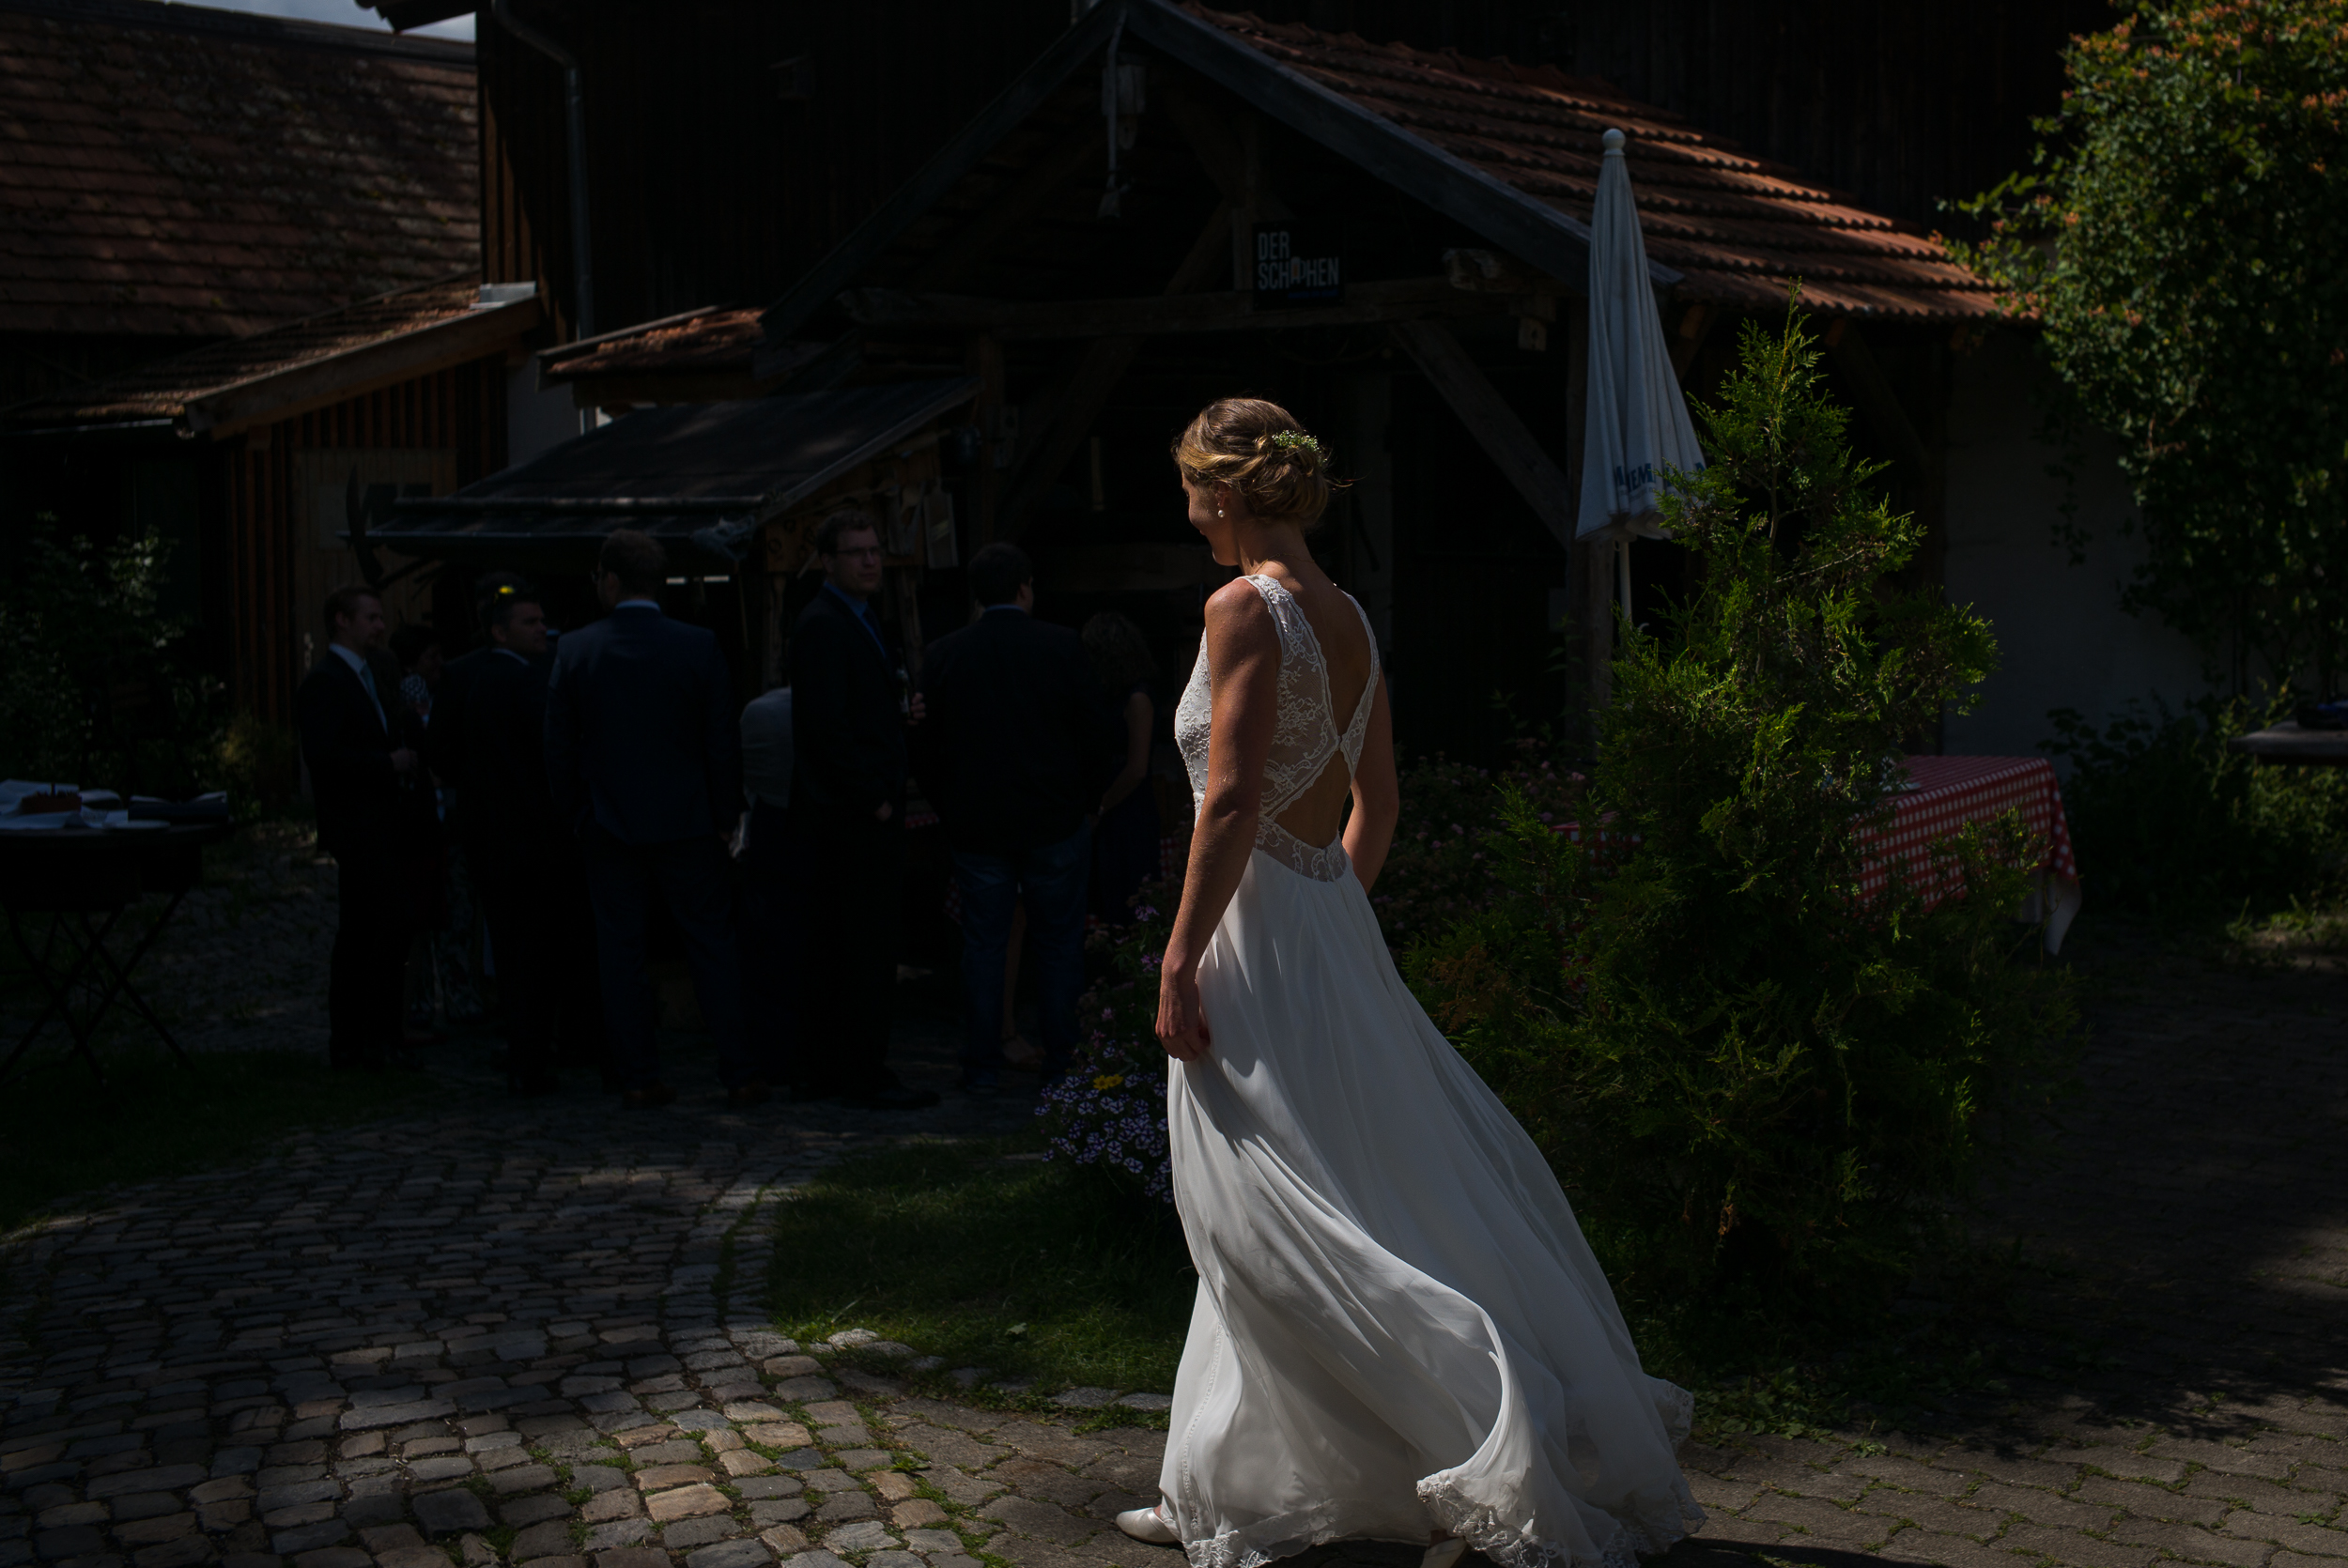 Gregg_Thorne_Wedding_Photographer_Munich_048.jpg